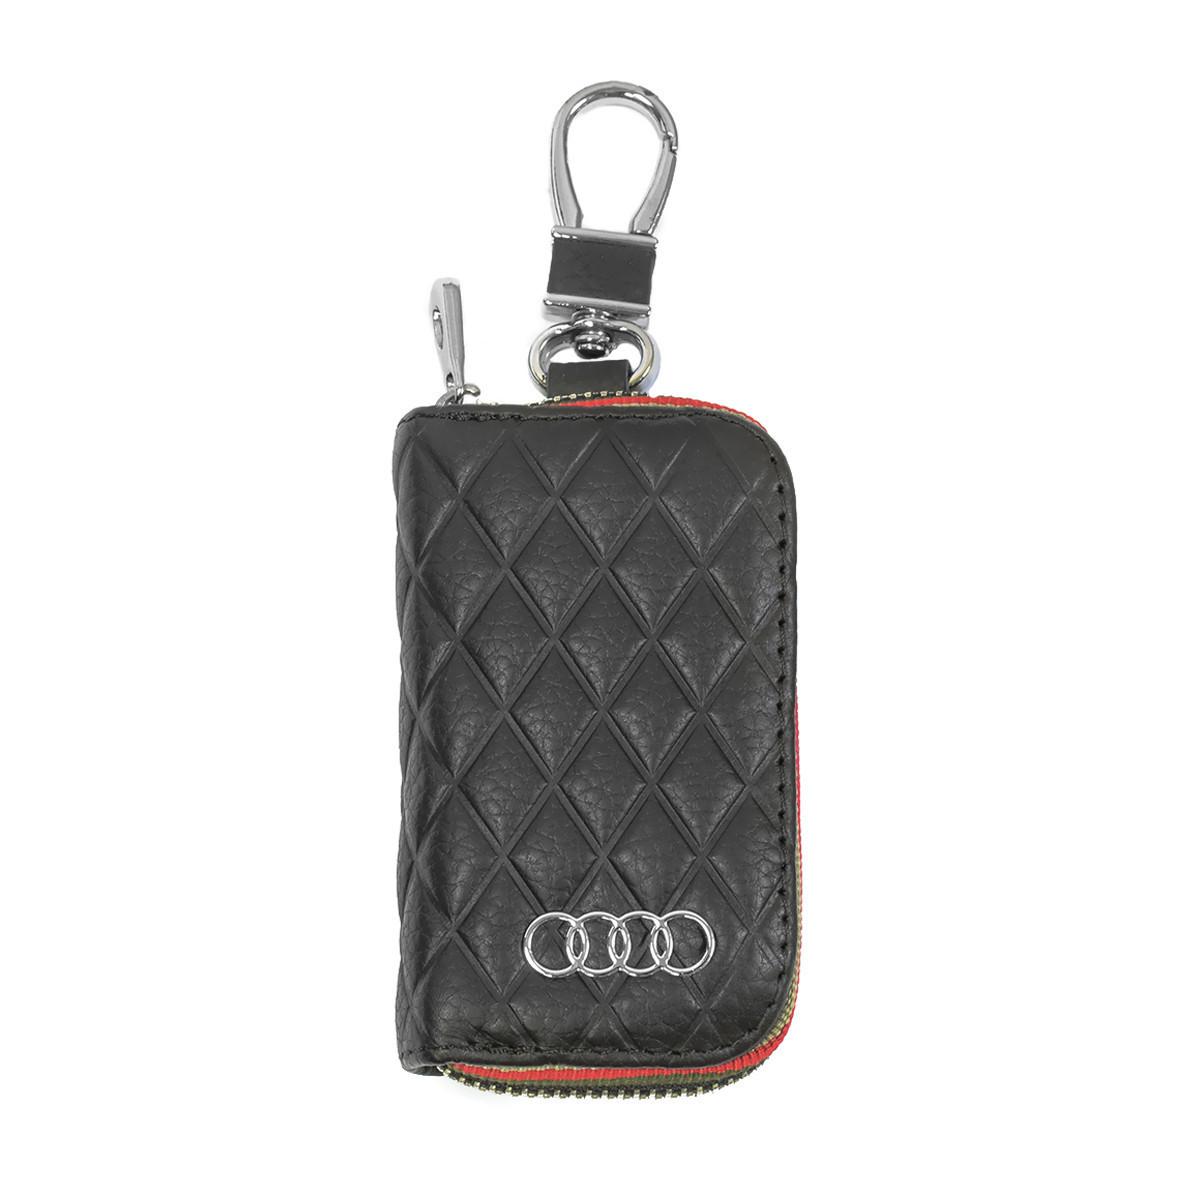 Ключница Carss с логотипом AUDI 01009 черная